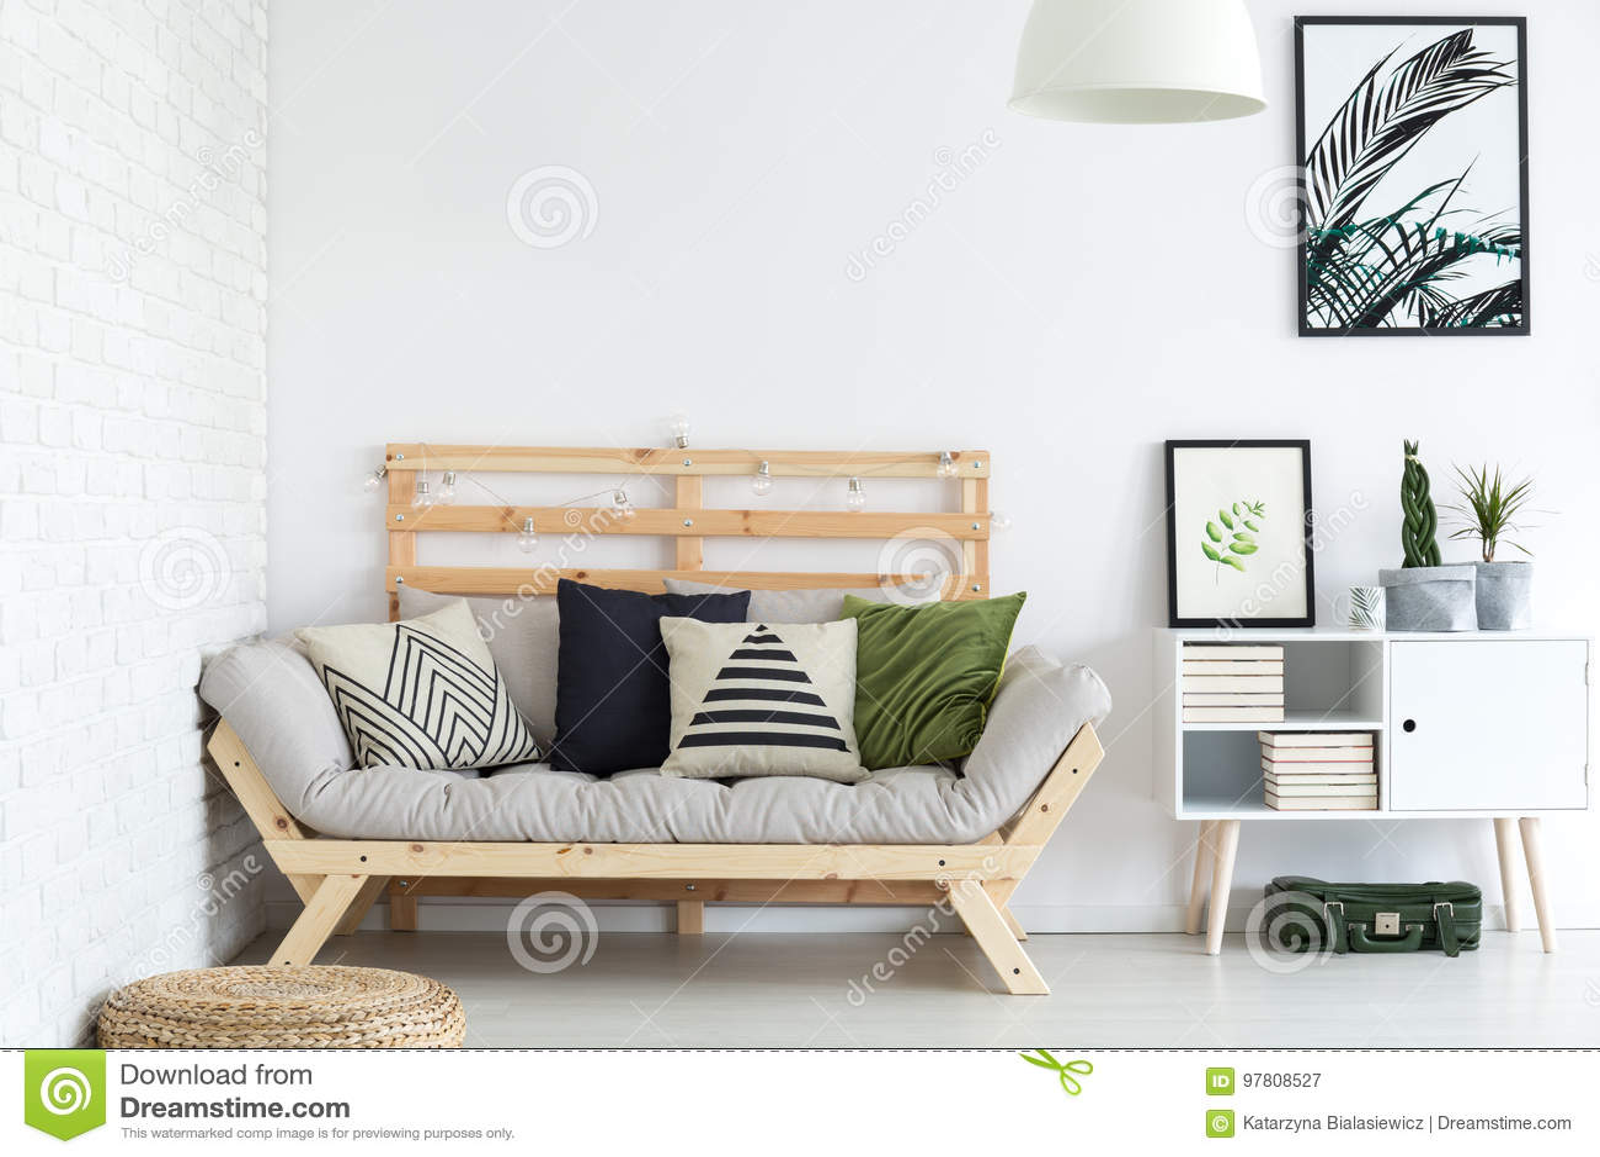 Living room decor stock image. Image of nordic, bricks - 97808527